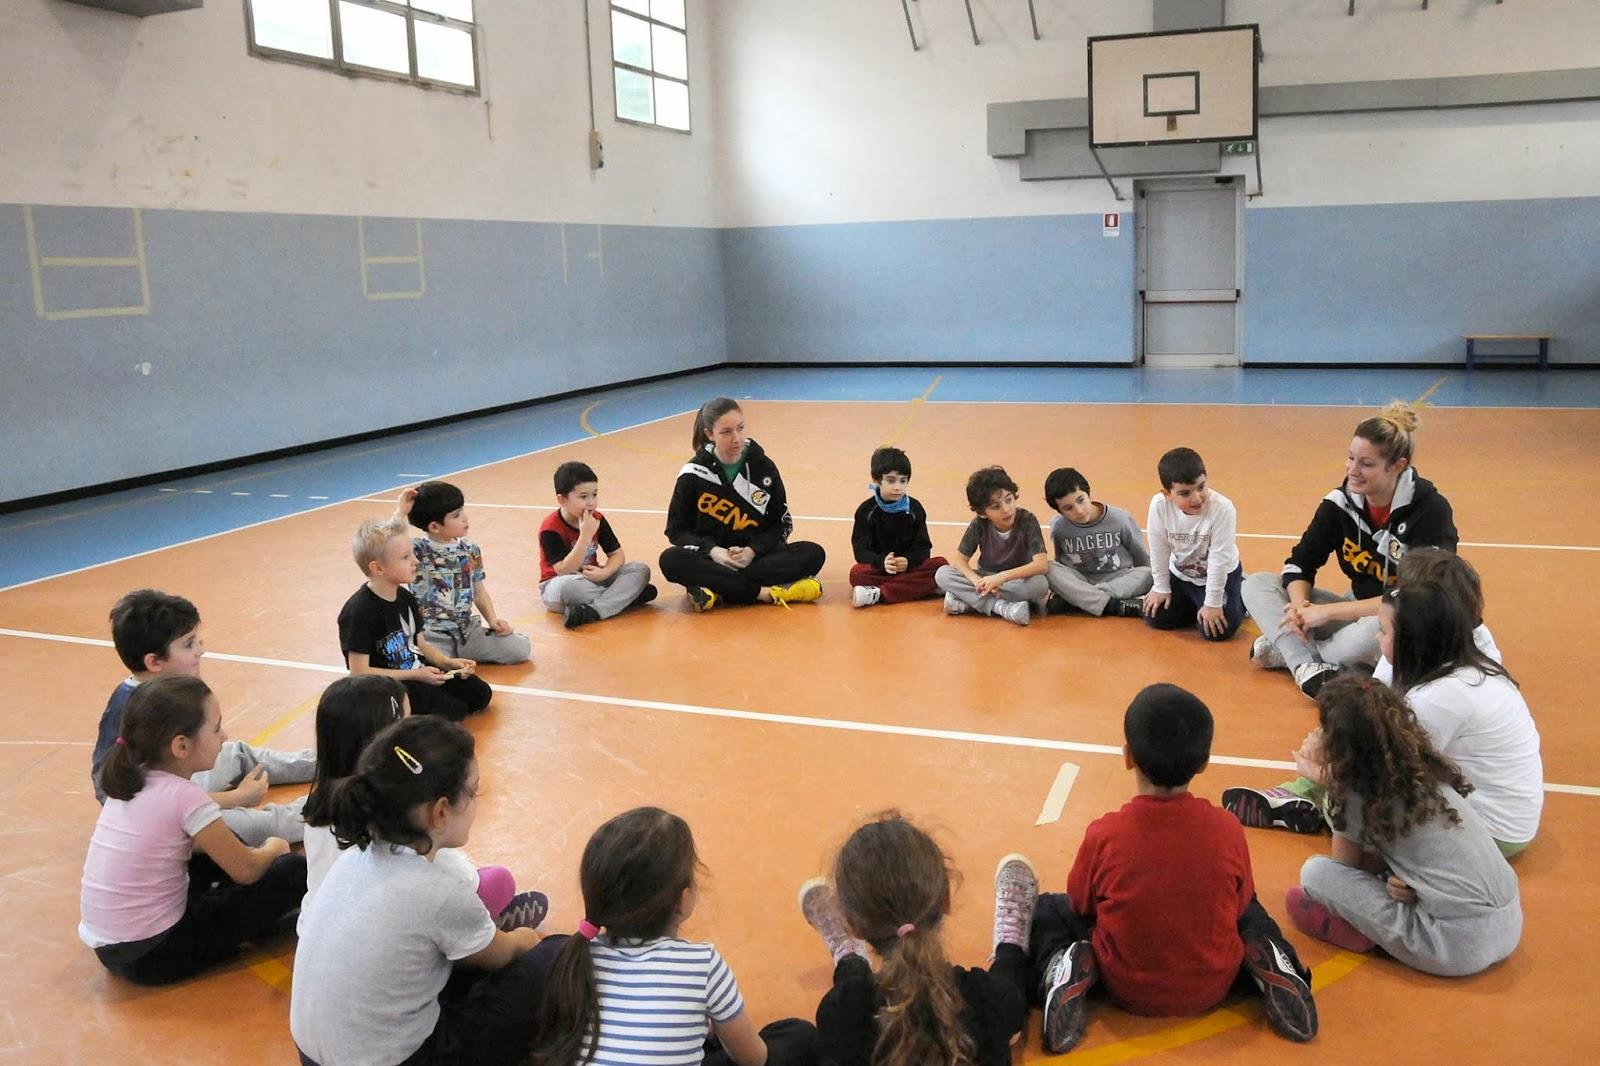 VOLLEY Beng, le insegnanti del volley